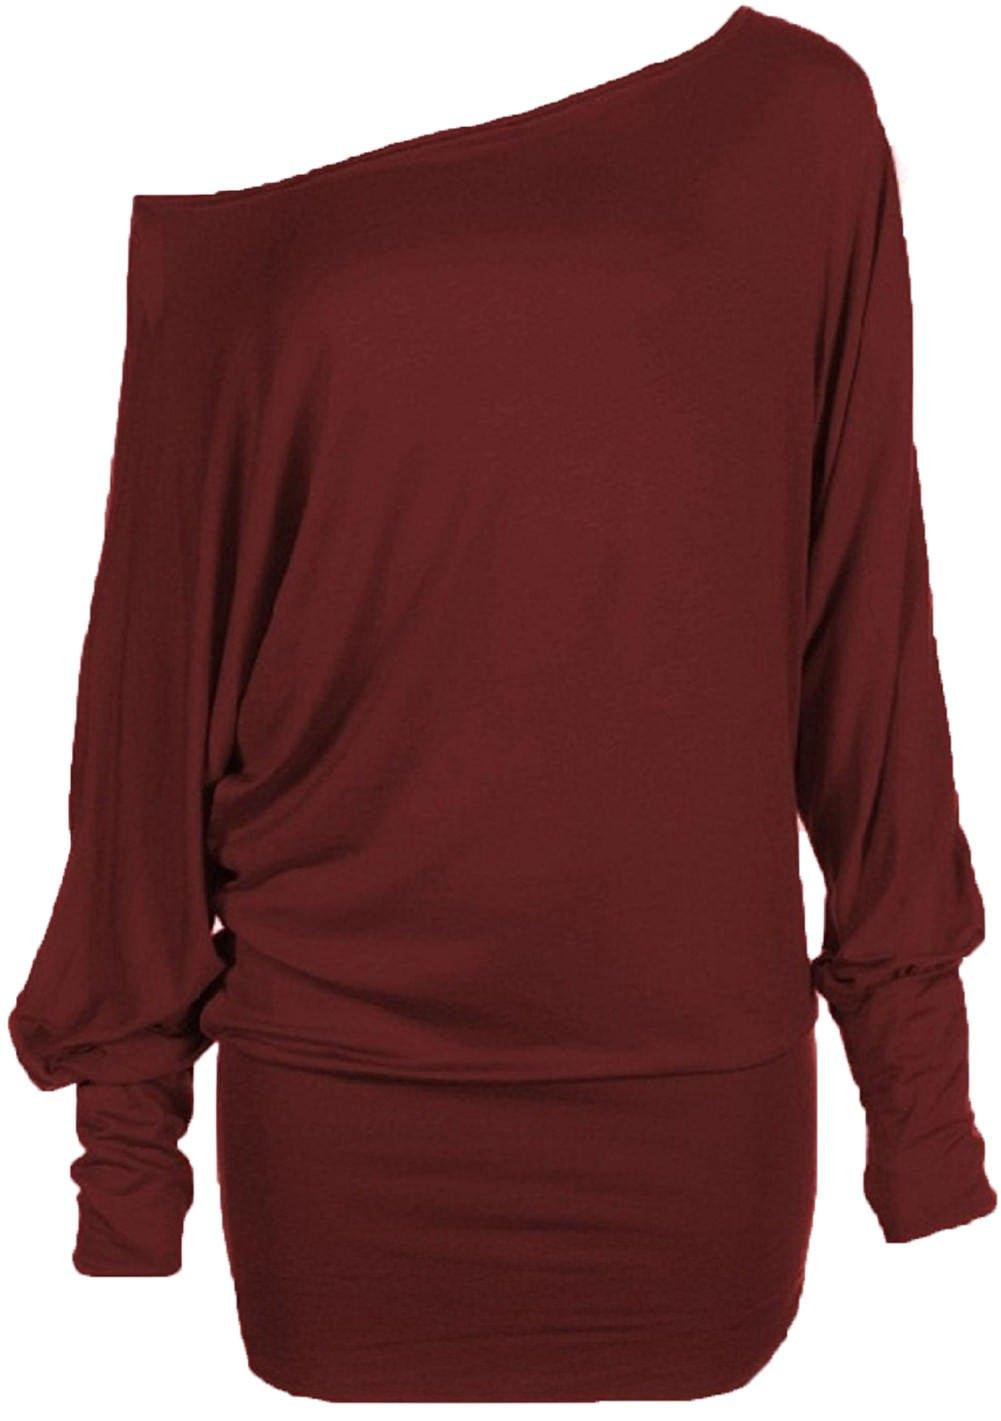 Hot Hanger Women's Long Sleeve Off Shoulder Plain Batwing Top FB-07